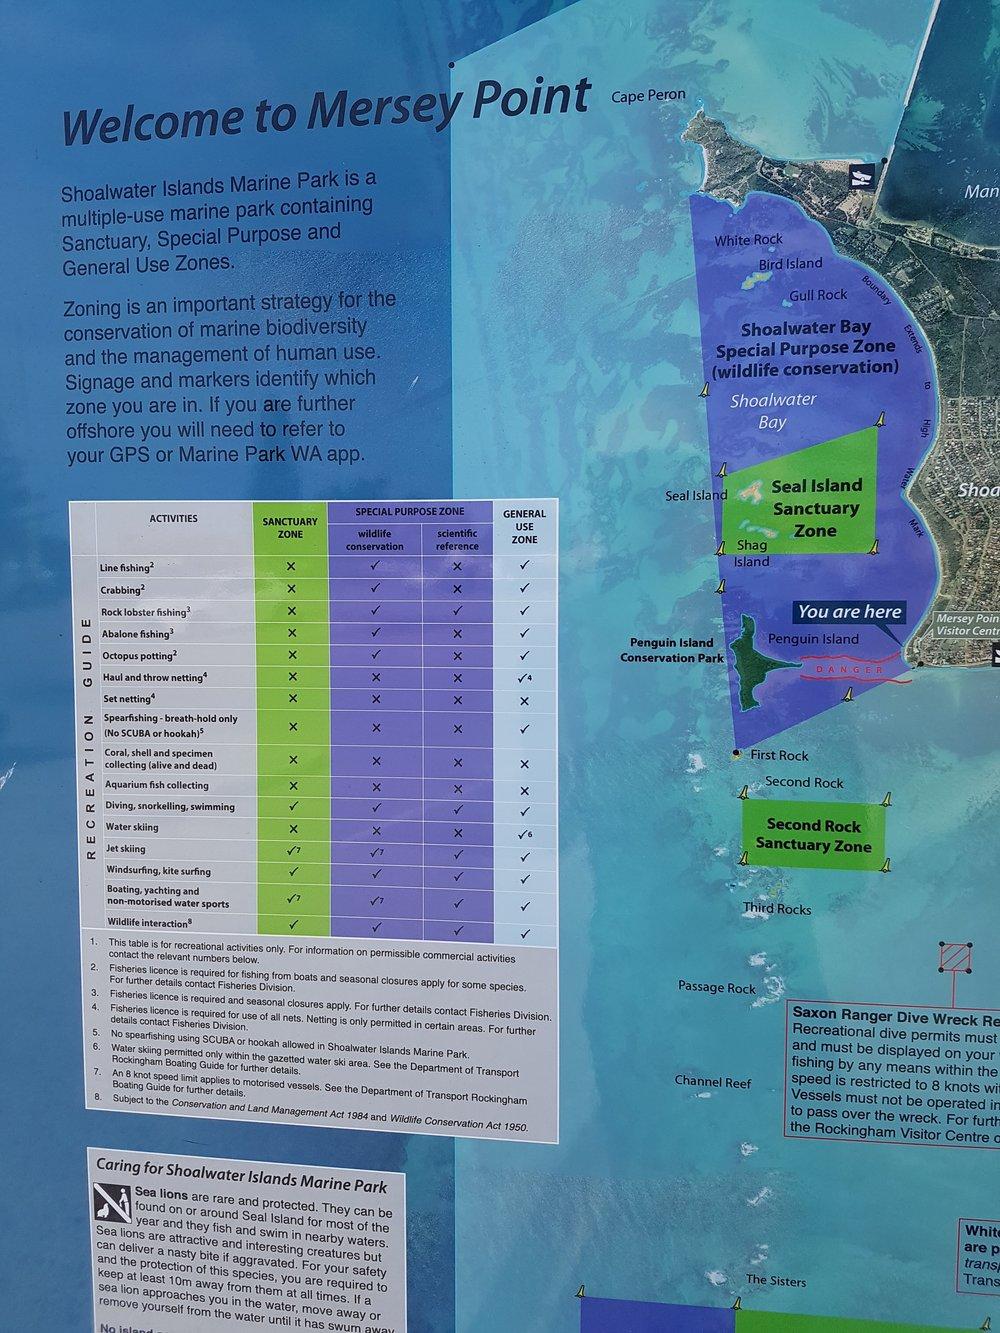 Shoalwater's sanctuary zones